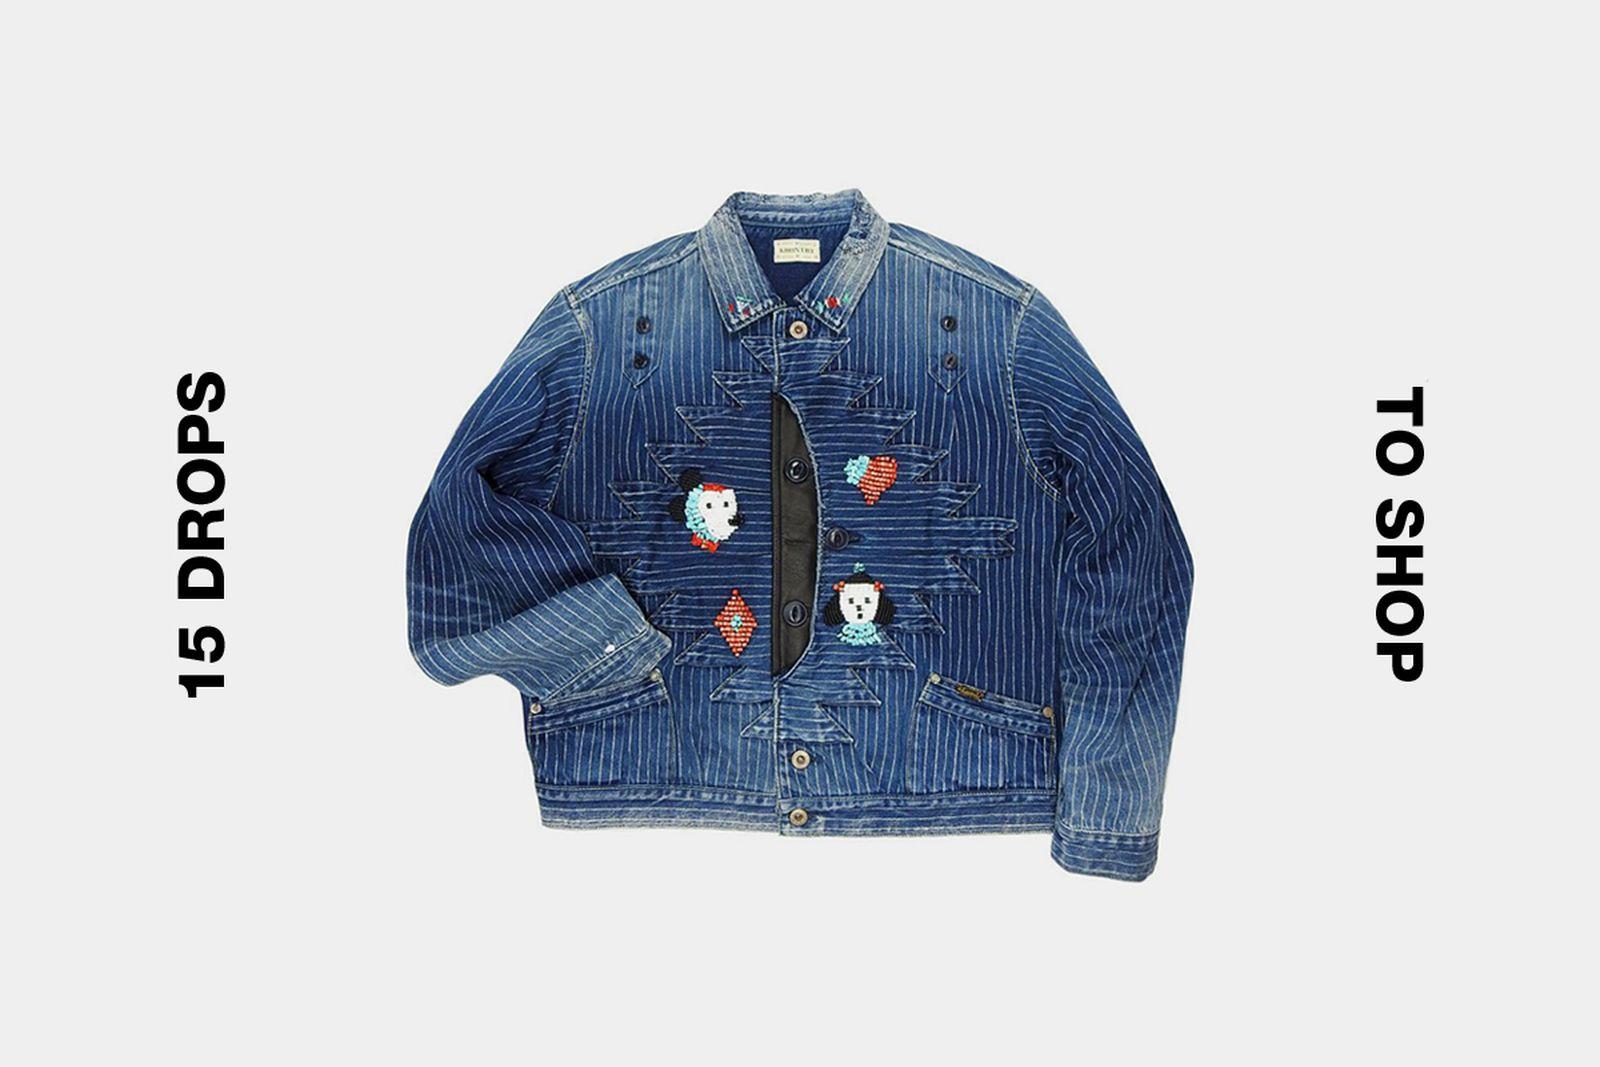 kapital wabash denim jacket best drops buy Acne Studios JJJJound Maison Mihara Yasuhiro